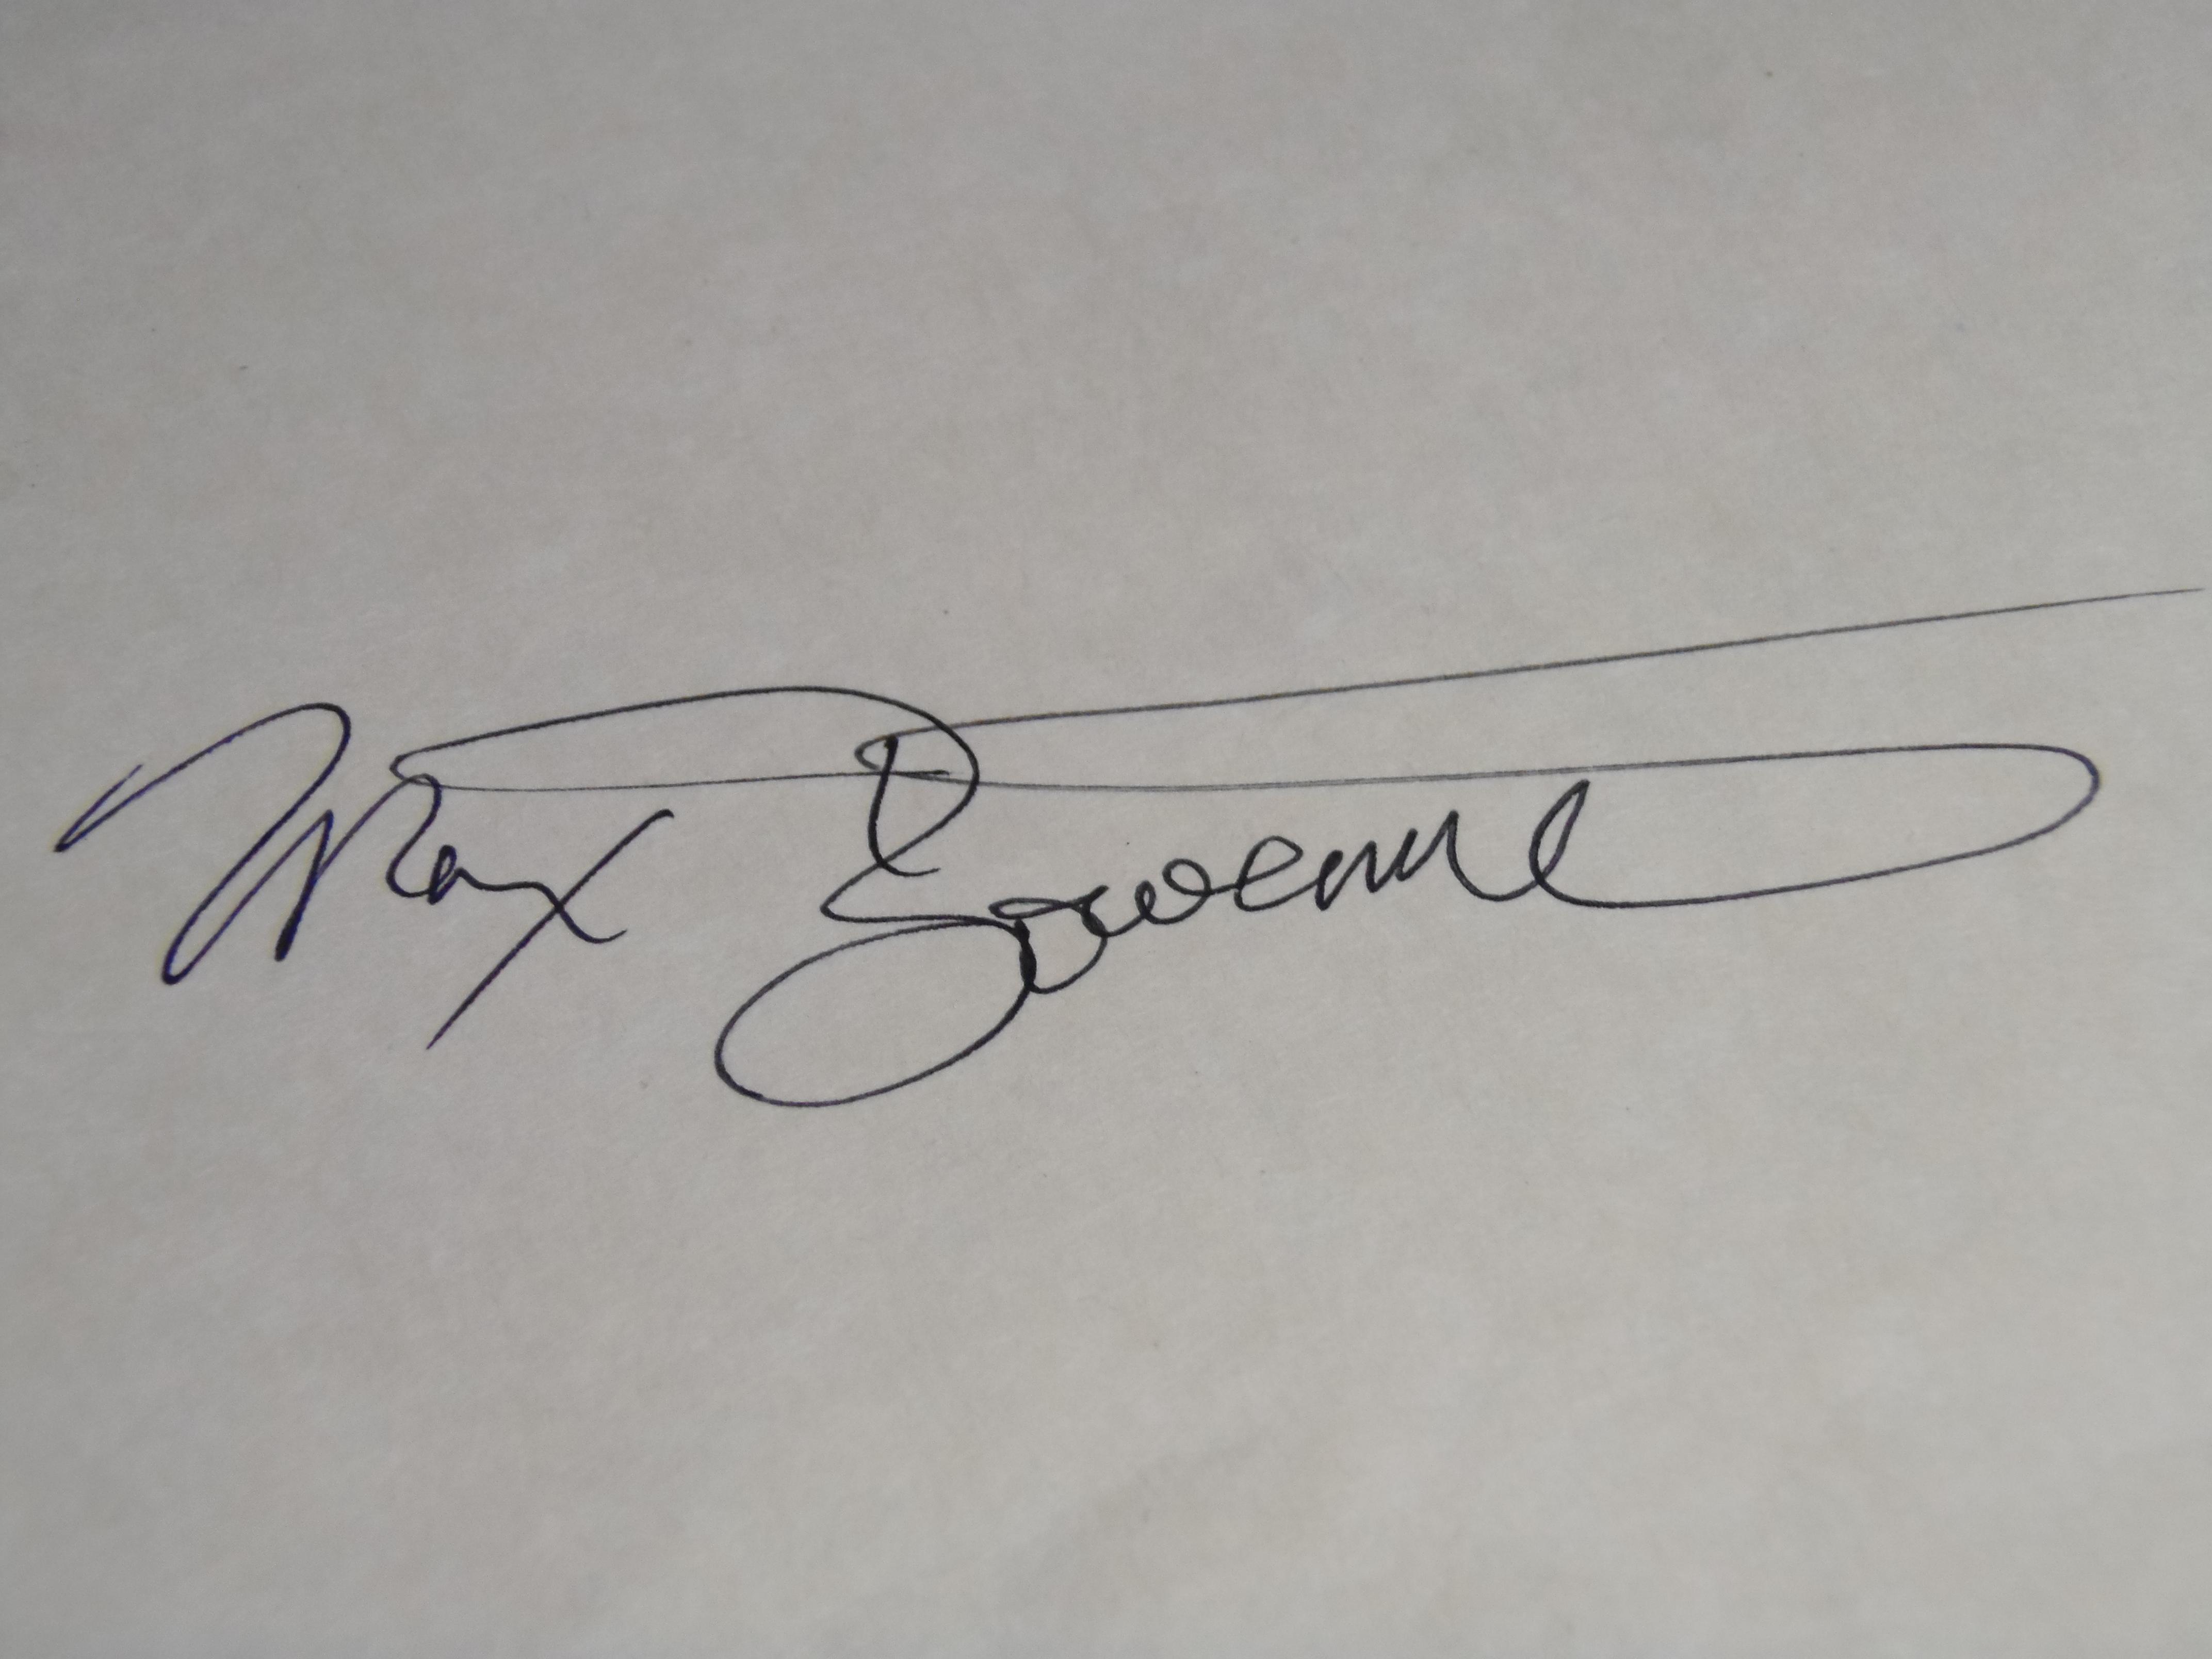 max bowermeister Signature